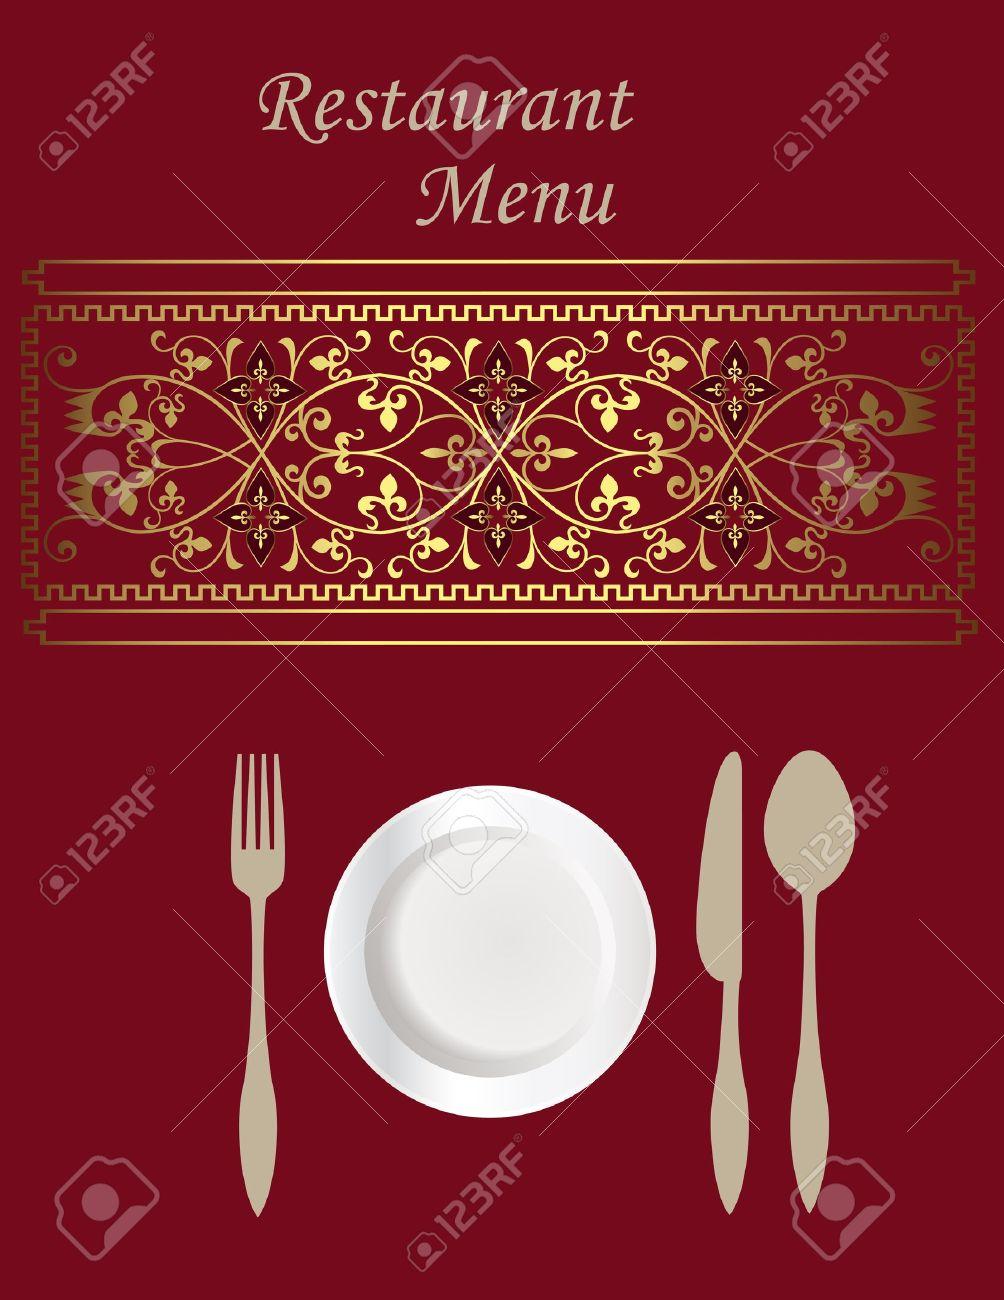 menu card design royalty free cliparts, vectors, and stock